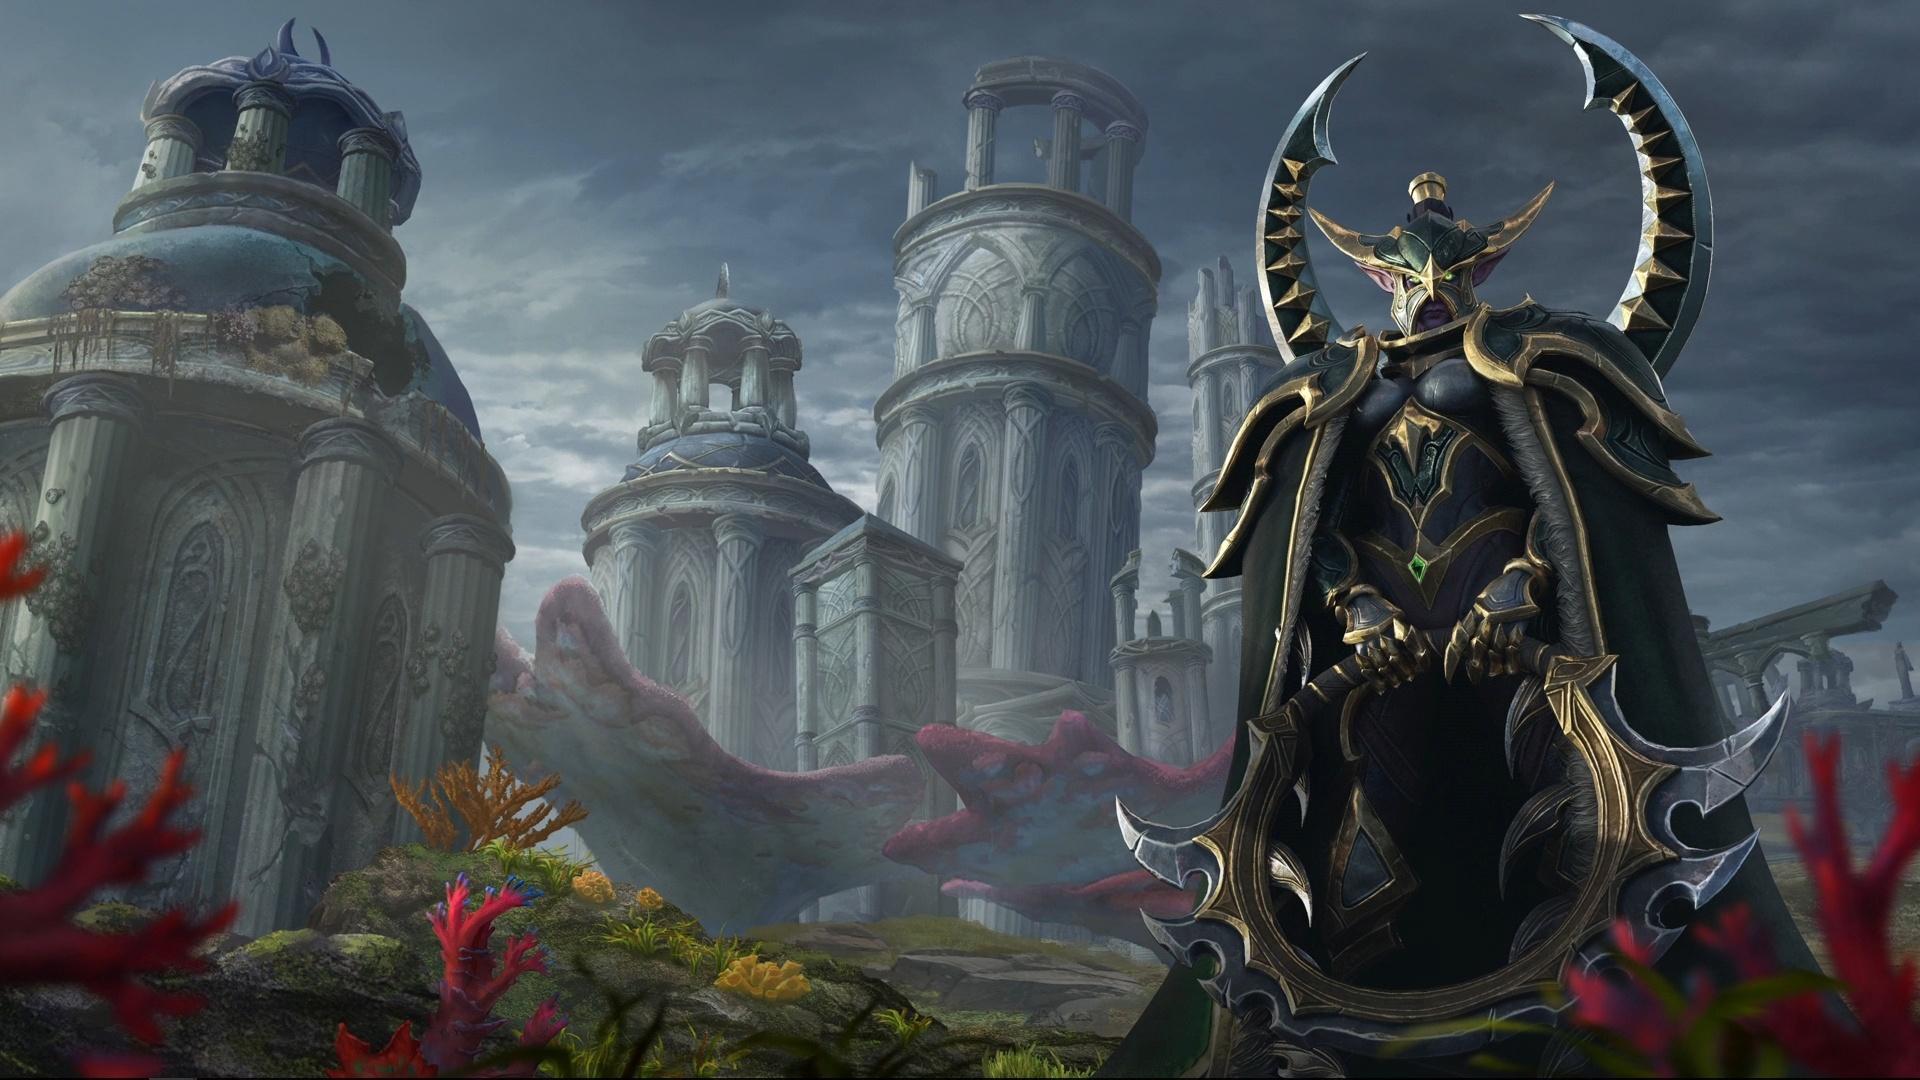 Warcraft Iii Reforged Cinematics And Screencaps Wowhead News